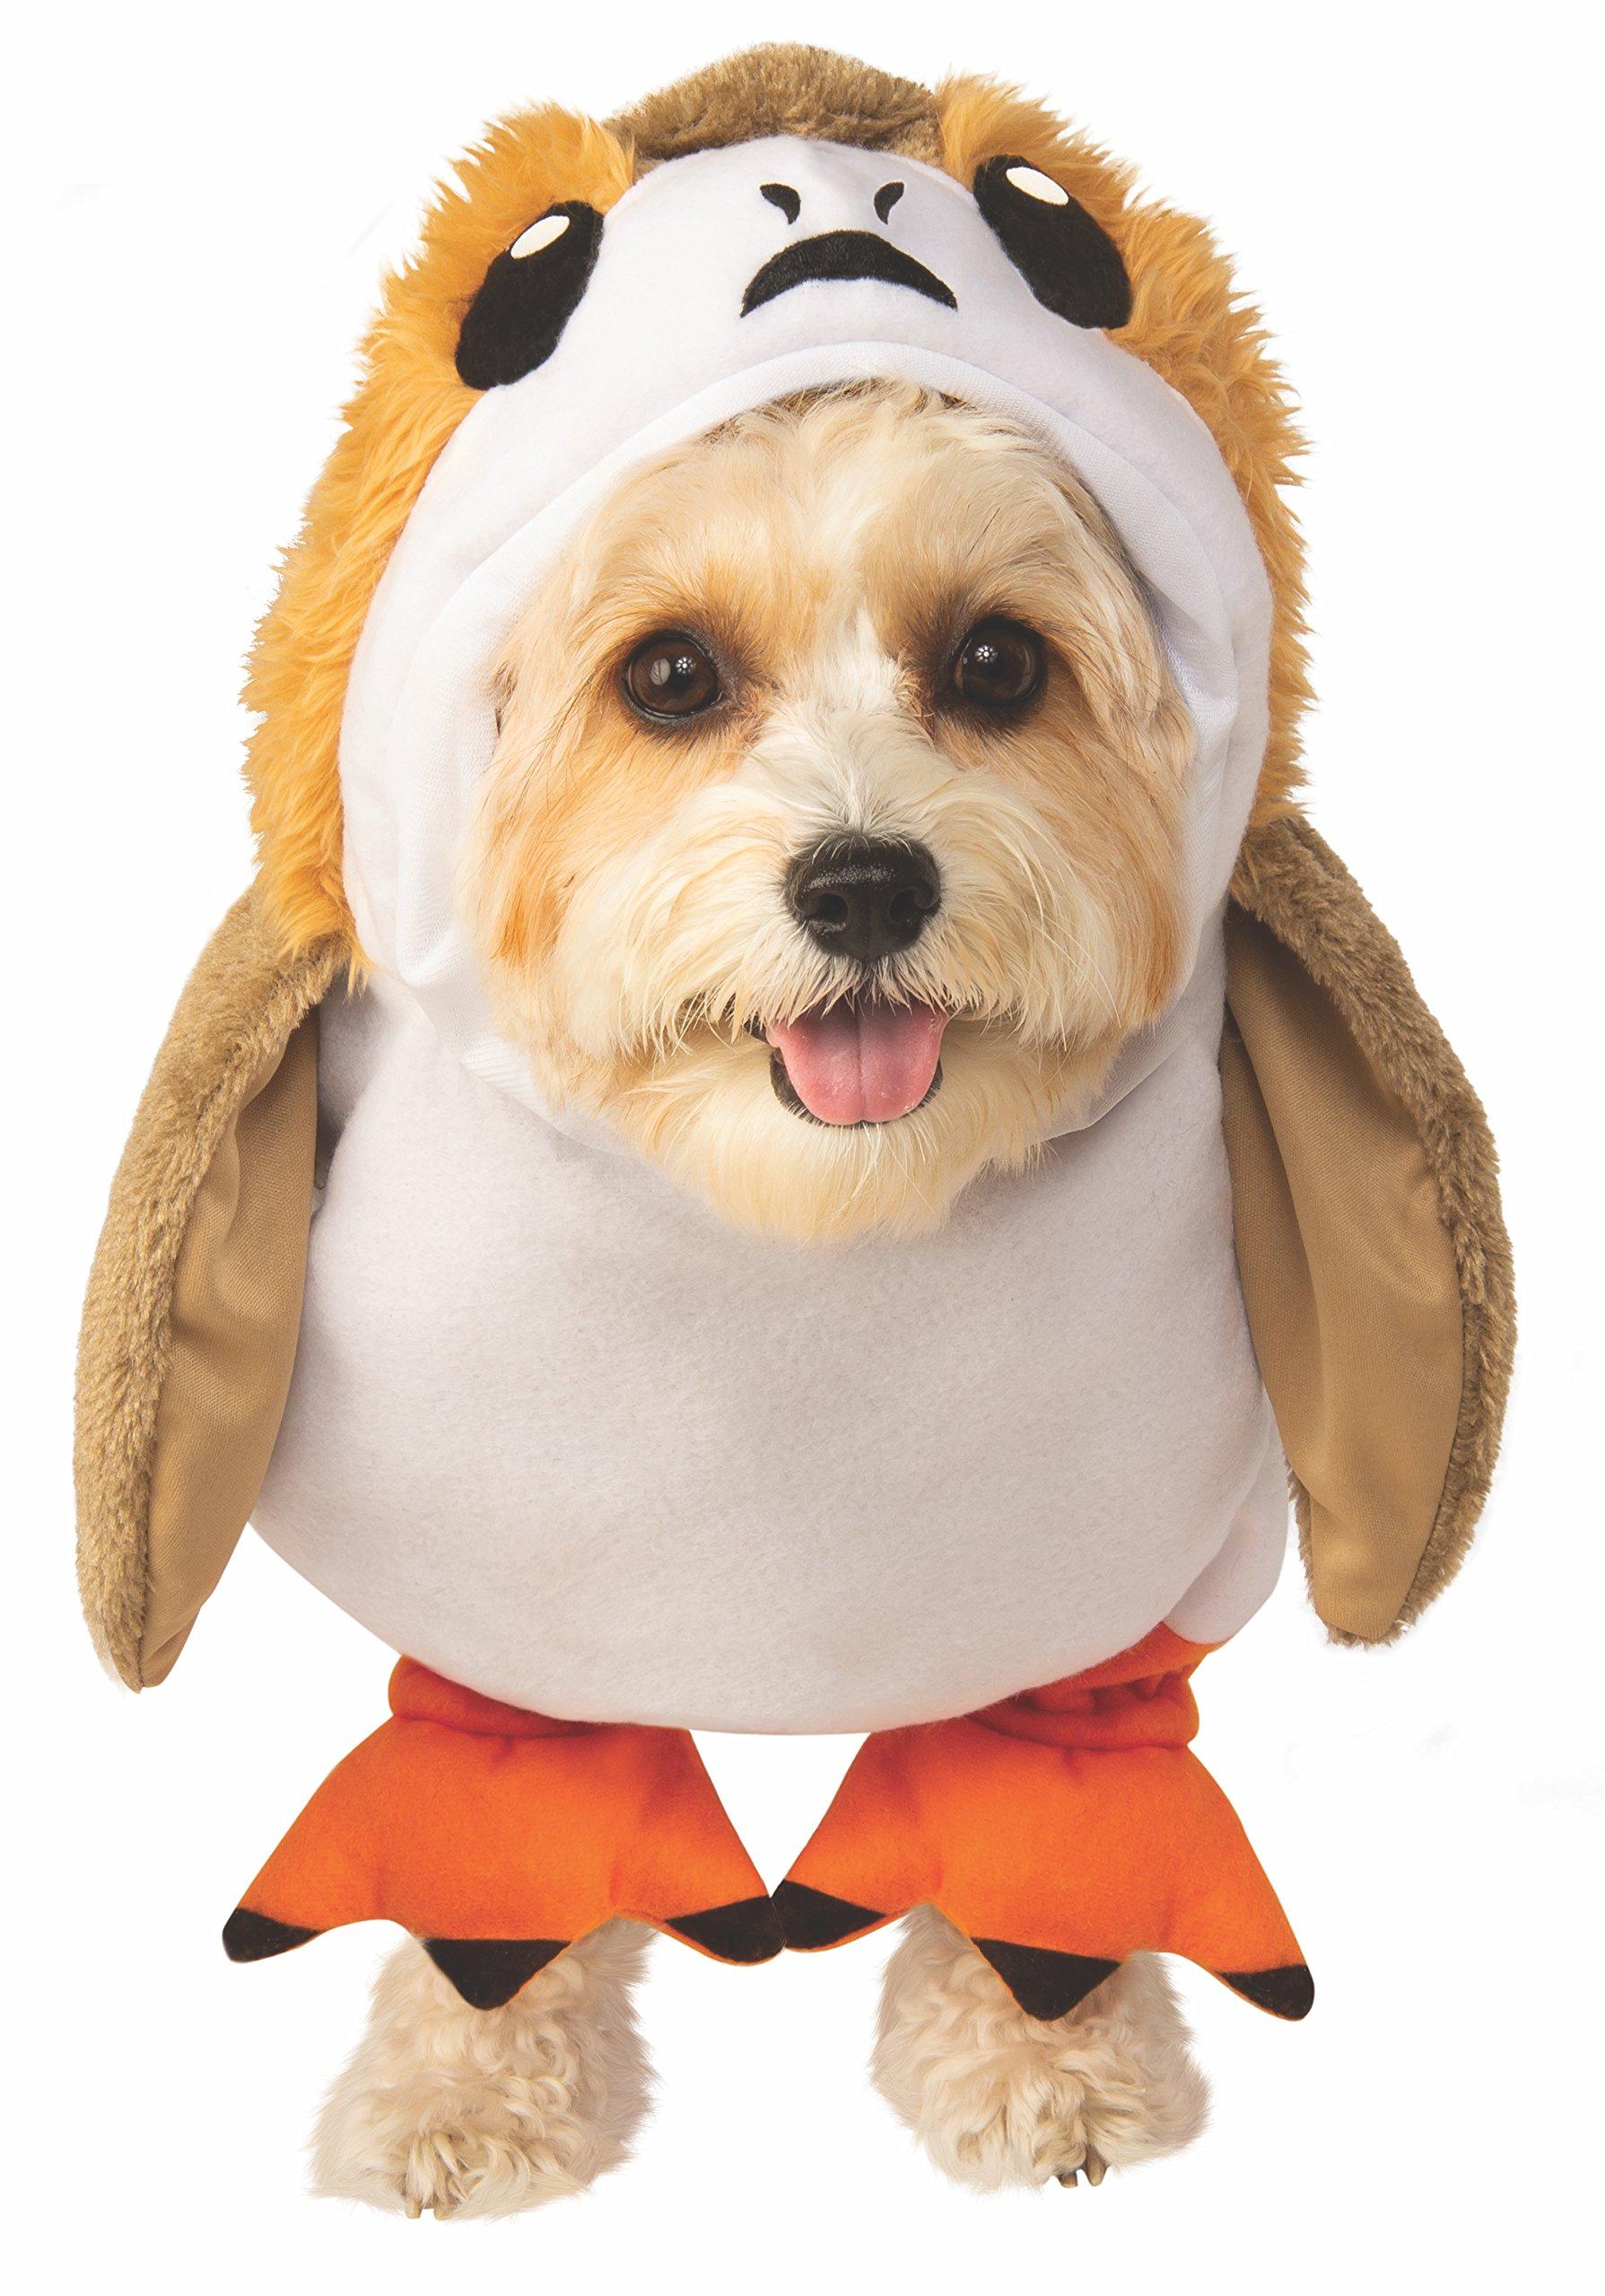 Rubie's Star Wars Porg Pet Costume, Large